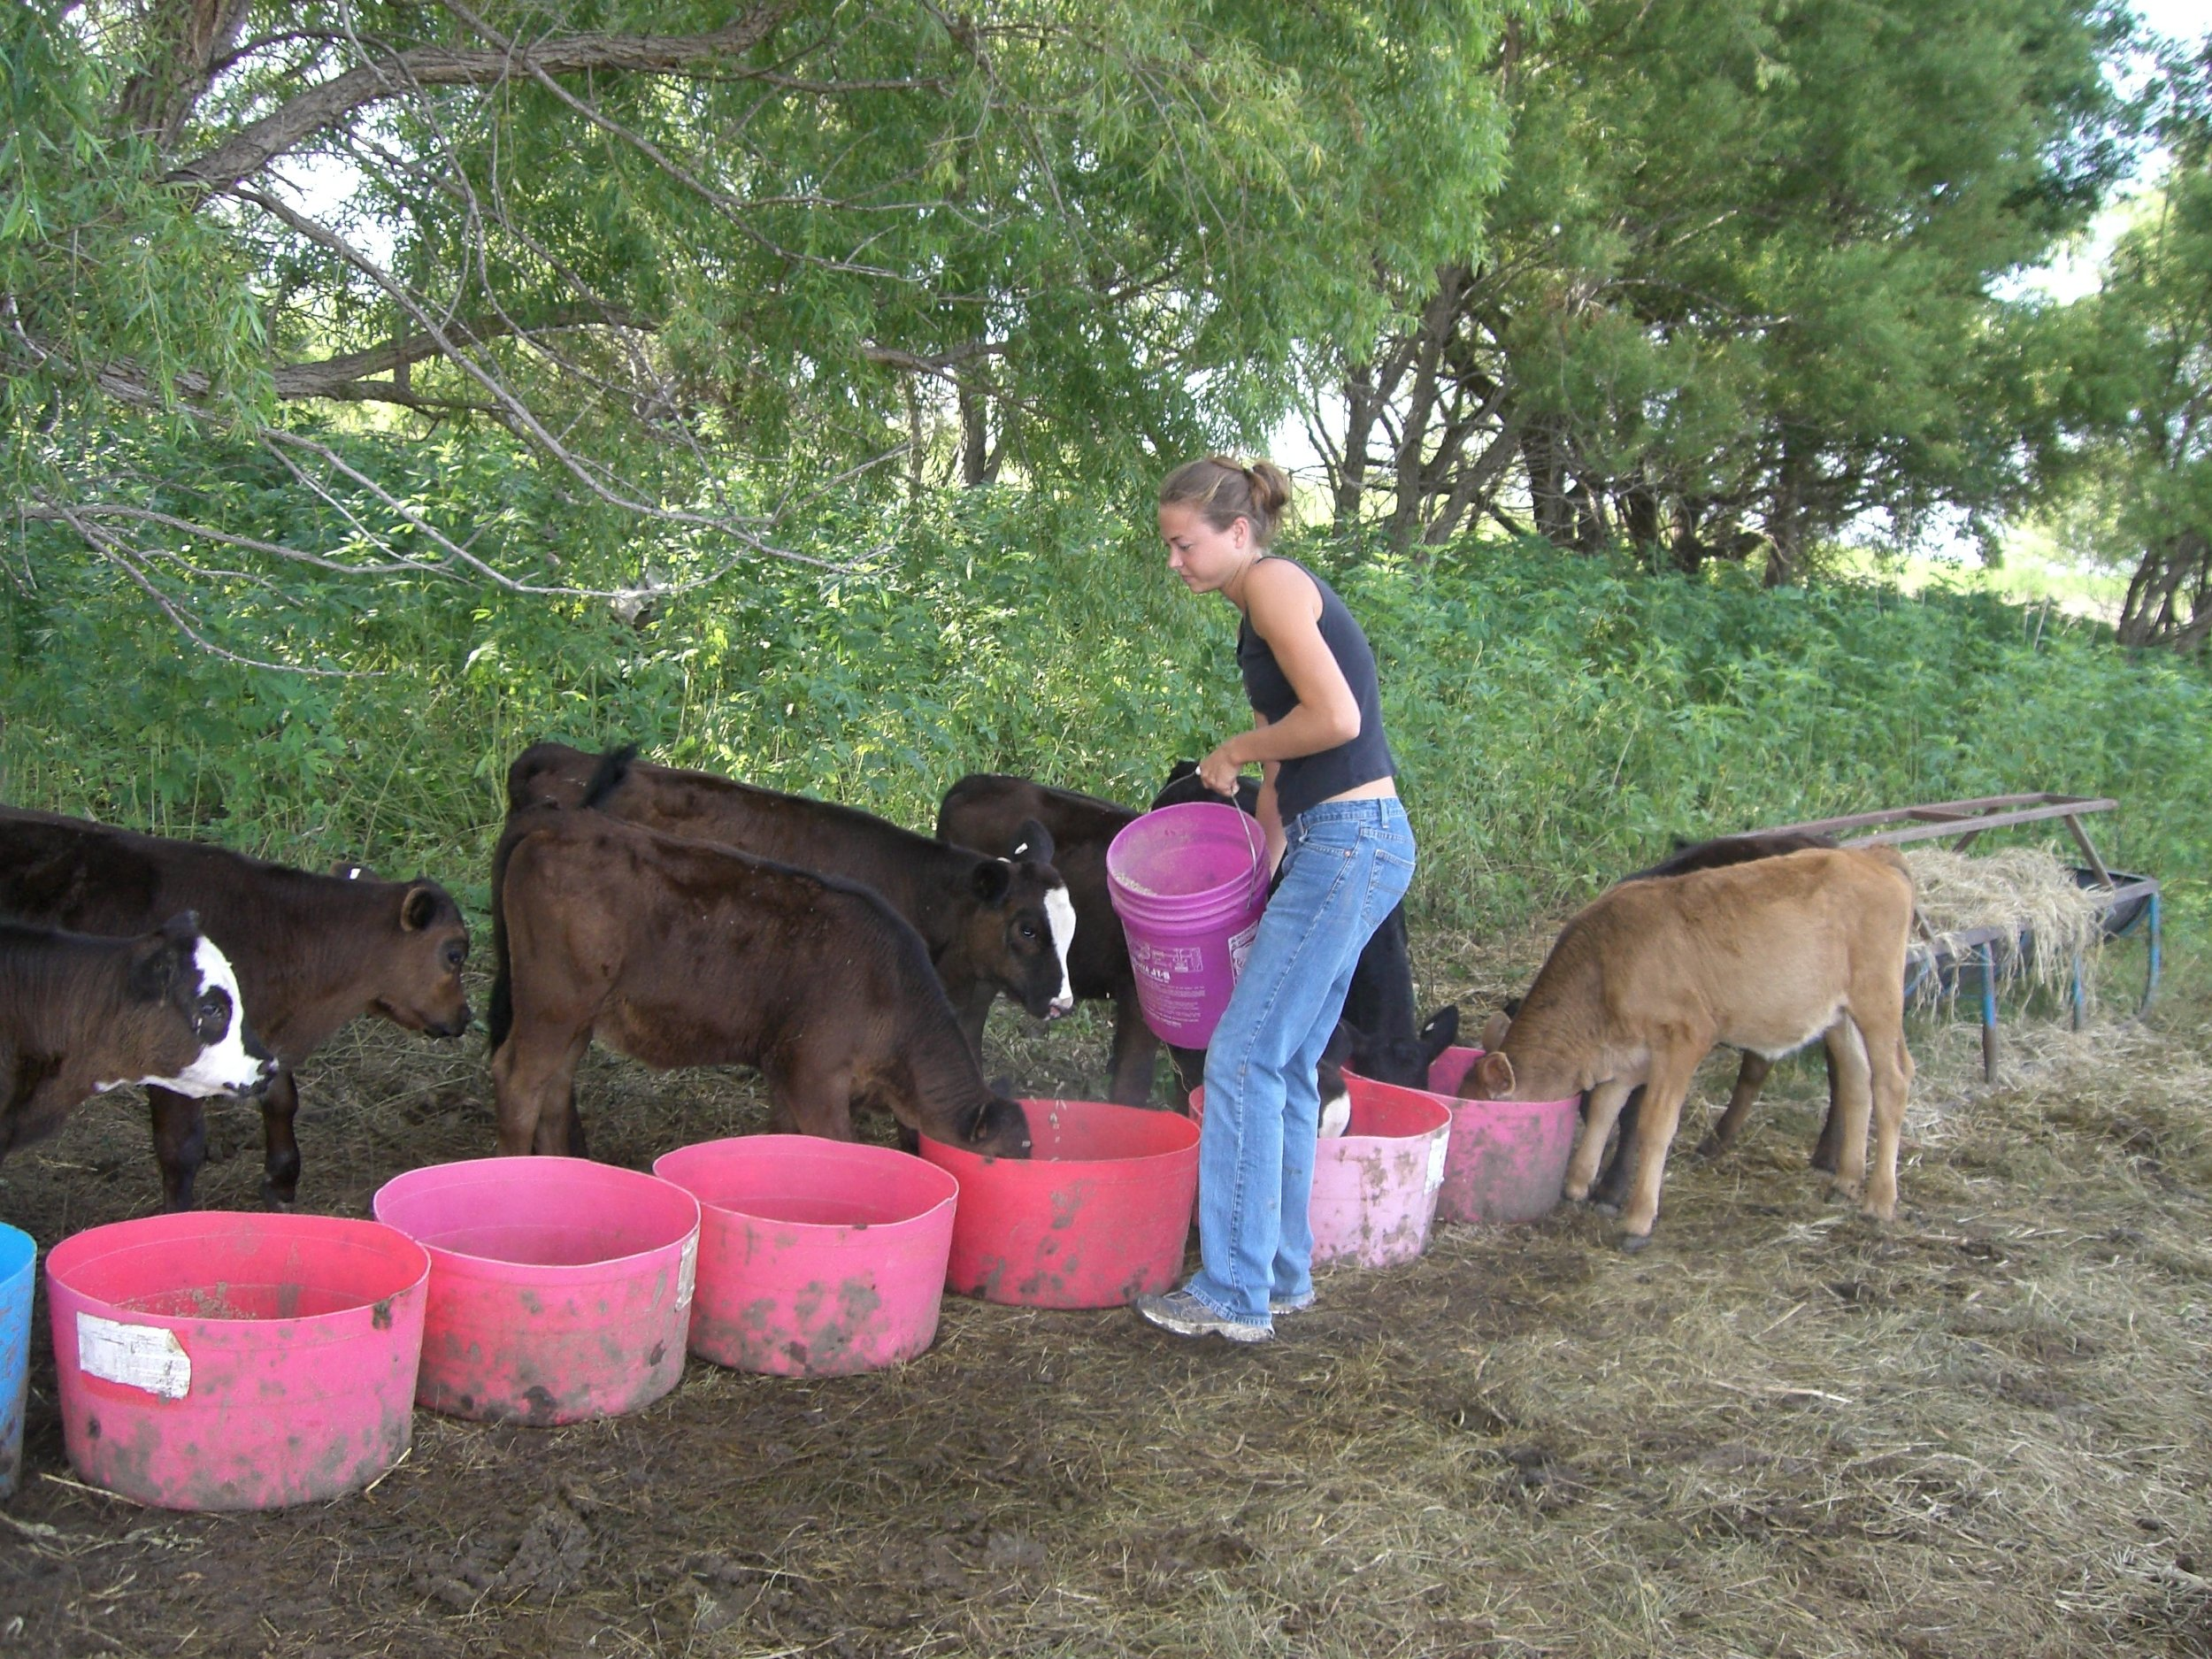 oklahoma natural beef certified natural 580 beef.jpg